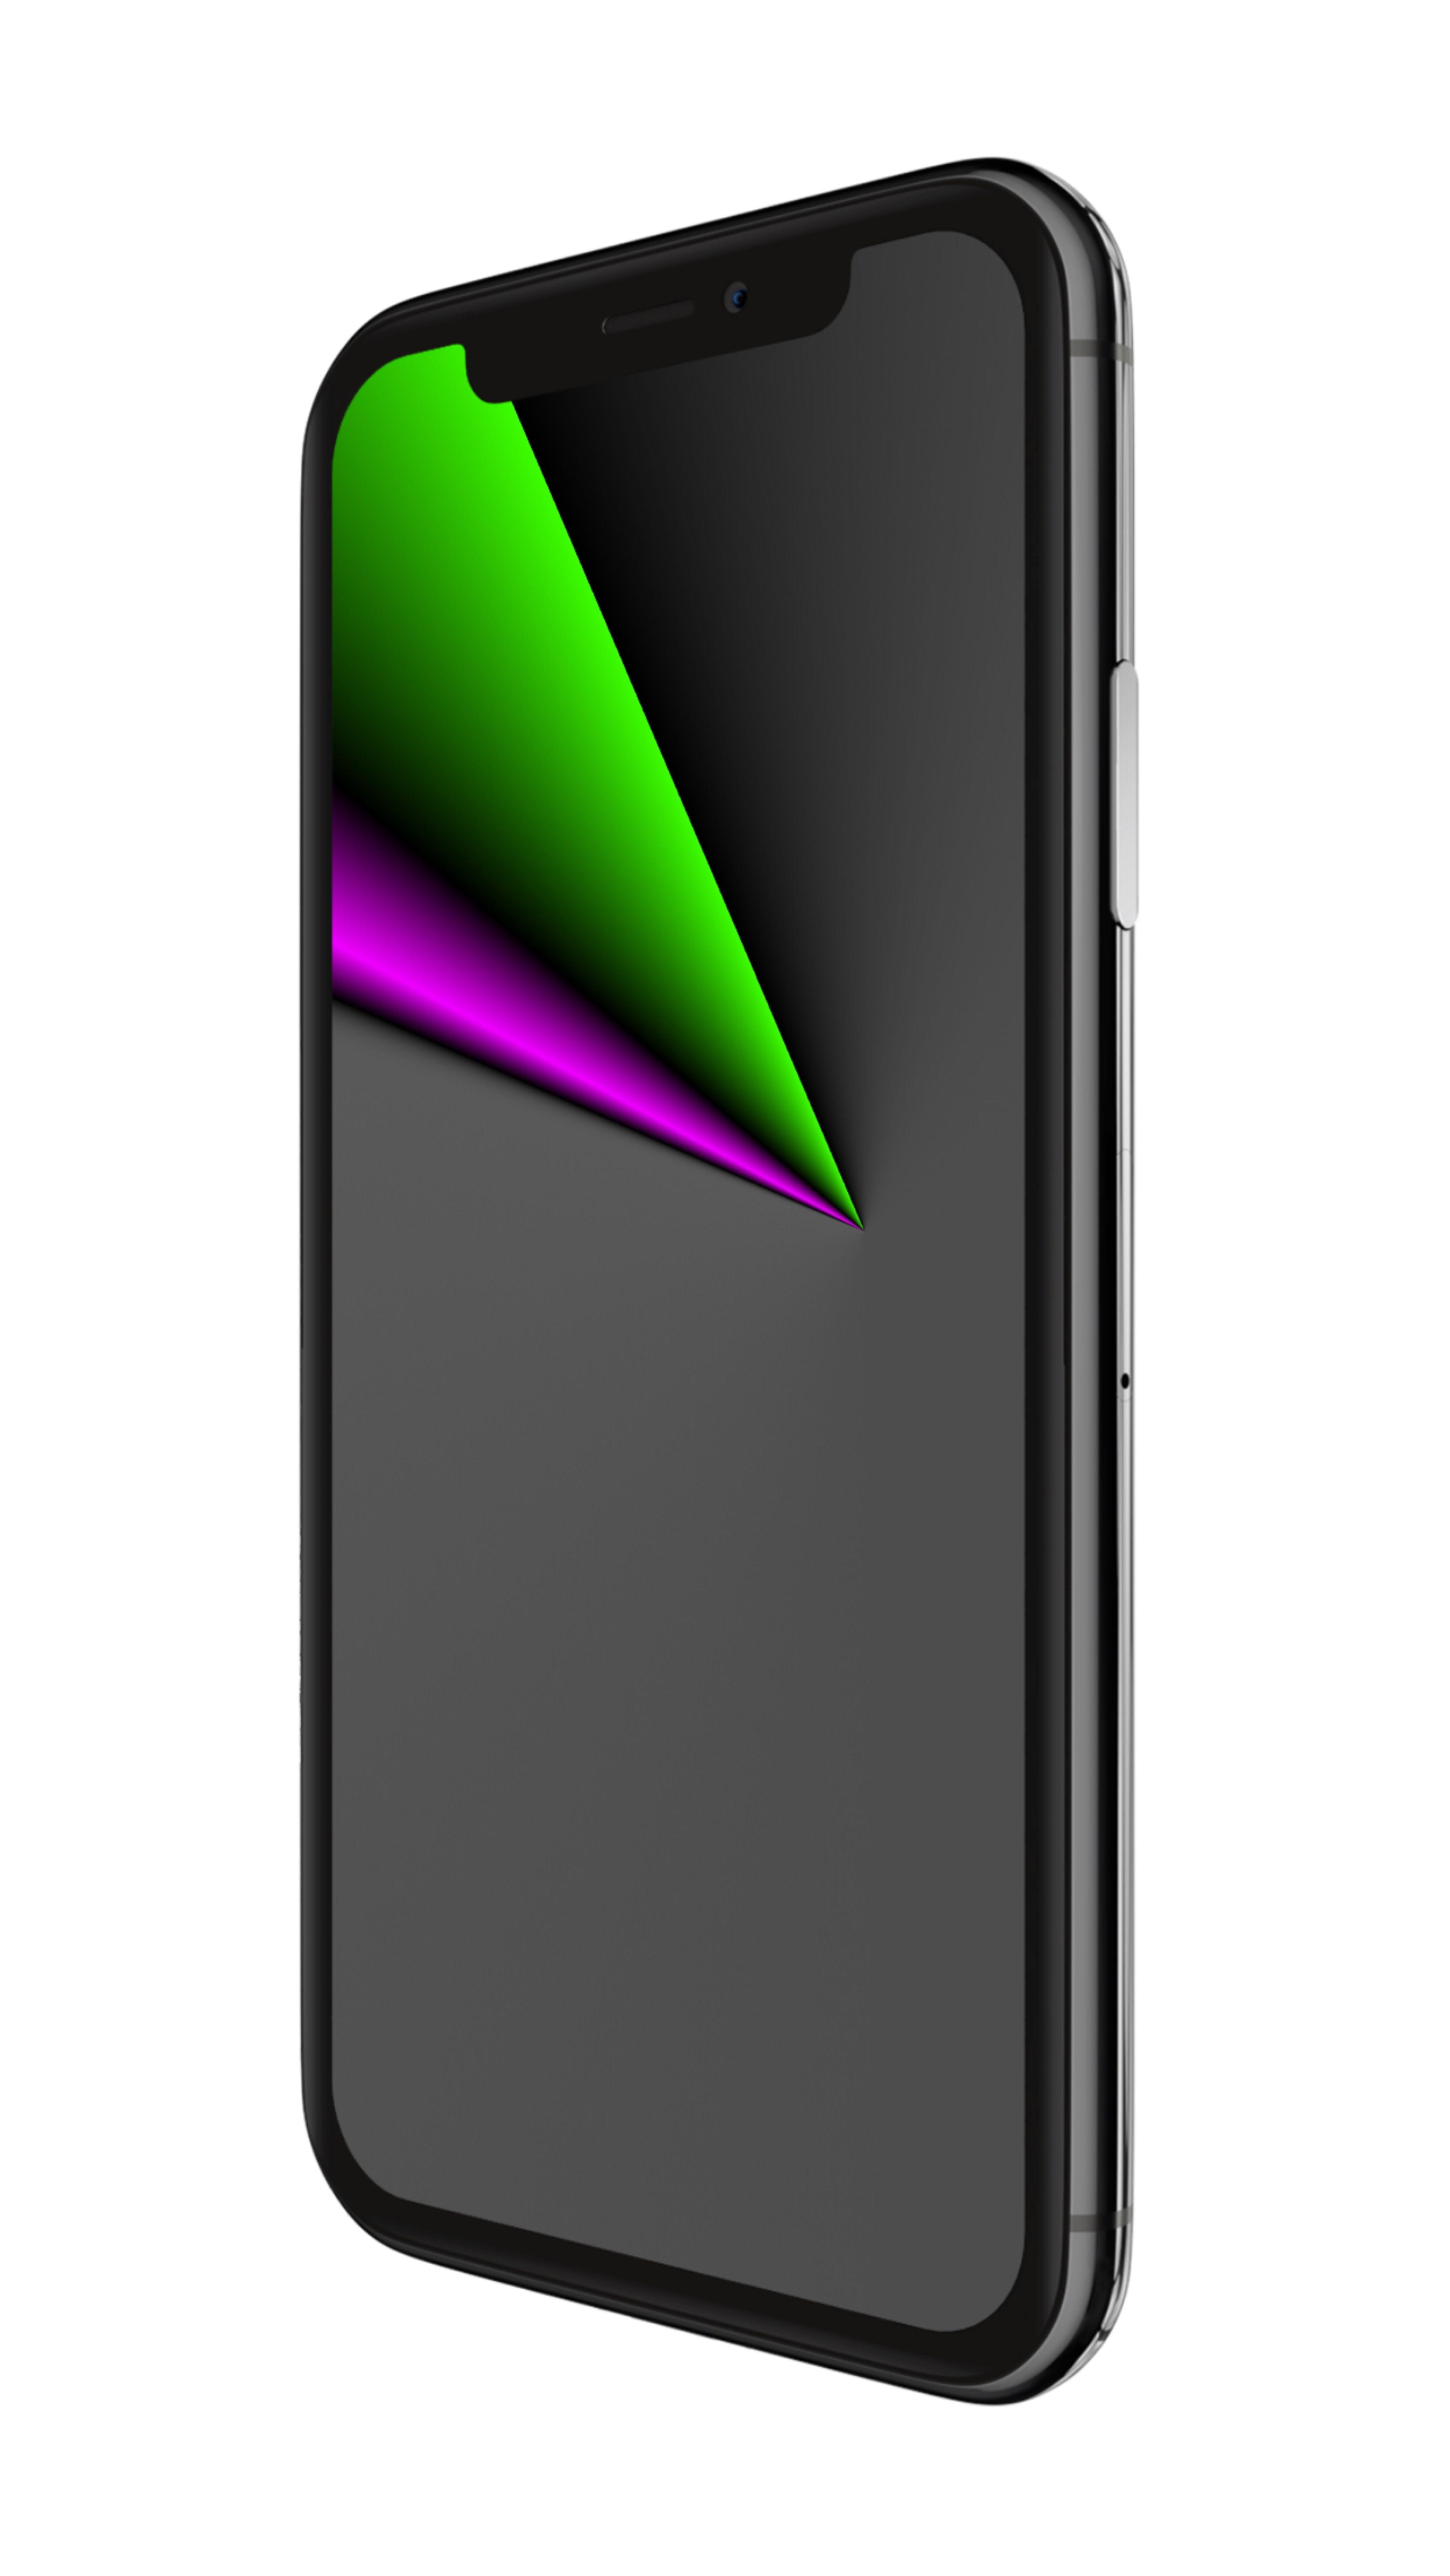 Phone Tablet Wallpaper Designed By Hotspot4u 4k Designer Wallpaper Tablet Wallpaper Hd Wallpaper Iphone